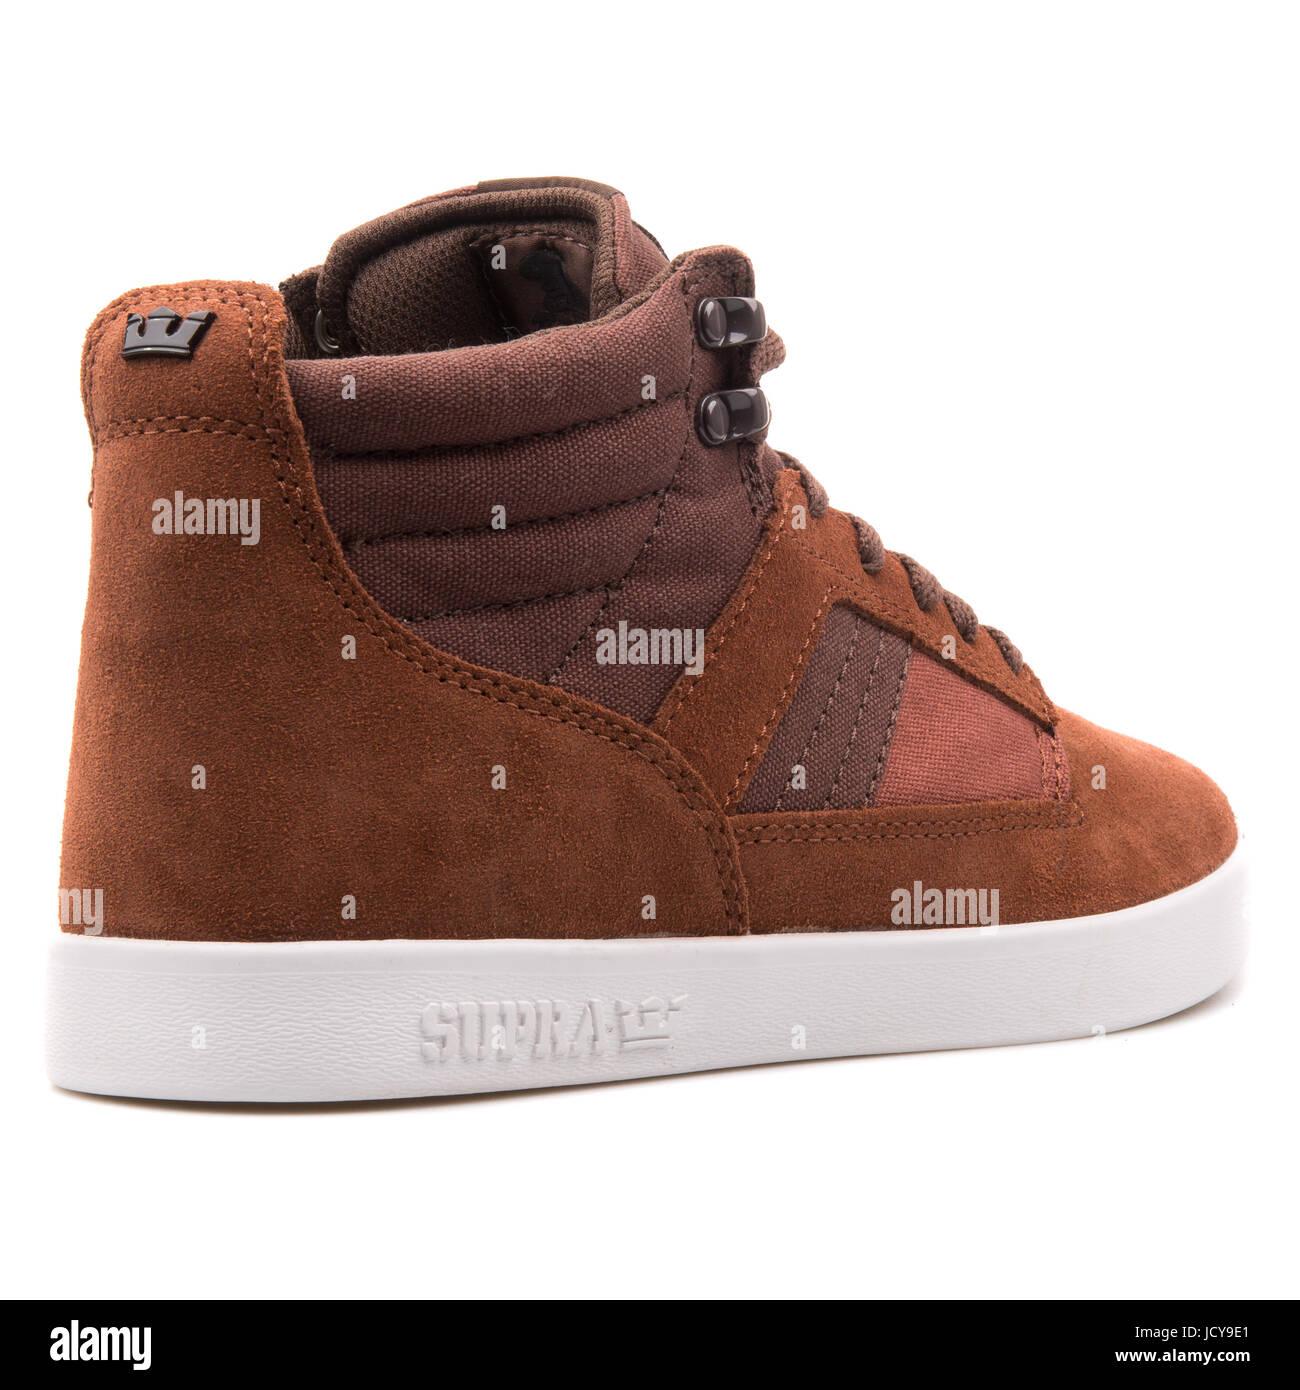 321f68ea1ea0 Supra Bandit Brown Chocolate White Men s Sportive Shoes - S39044 ...